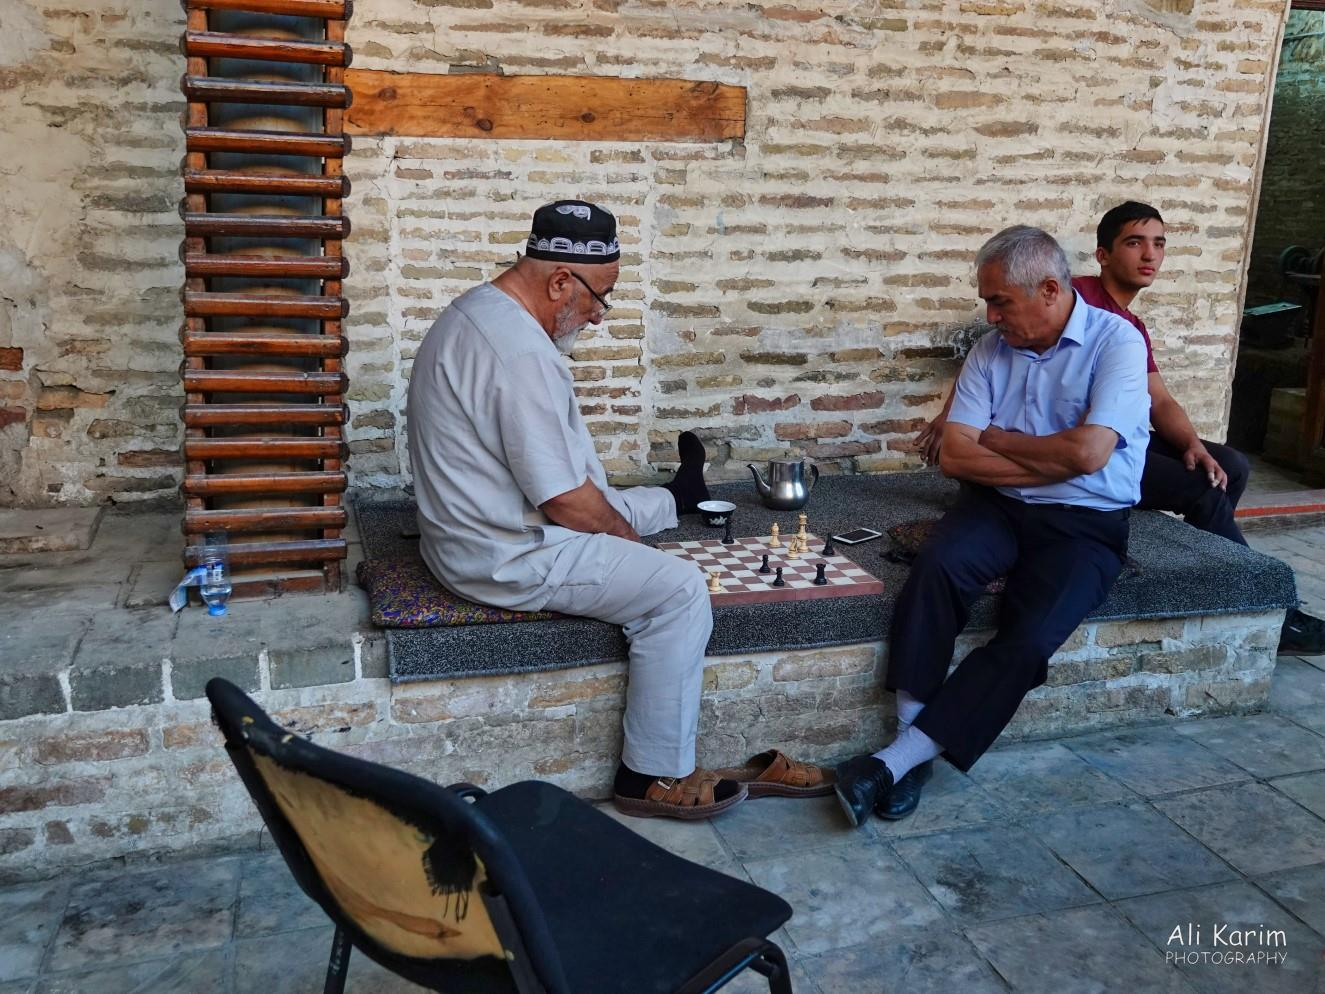 Bukhara, Oct 2019, Seniors enjoying a game of chess & tea